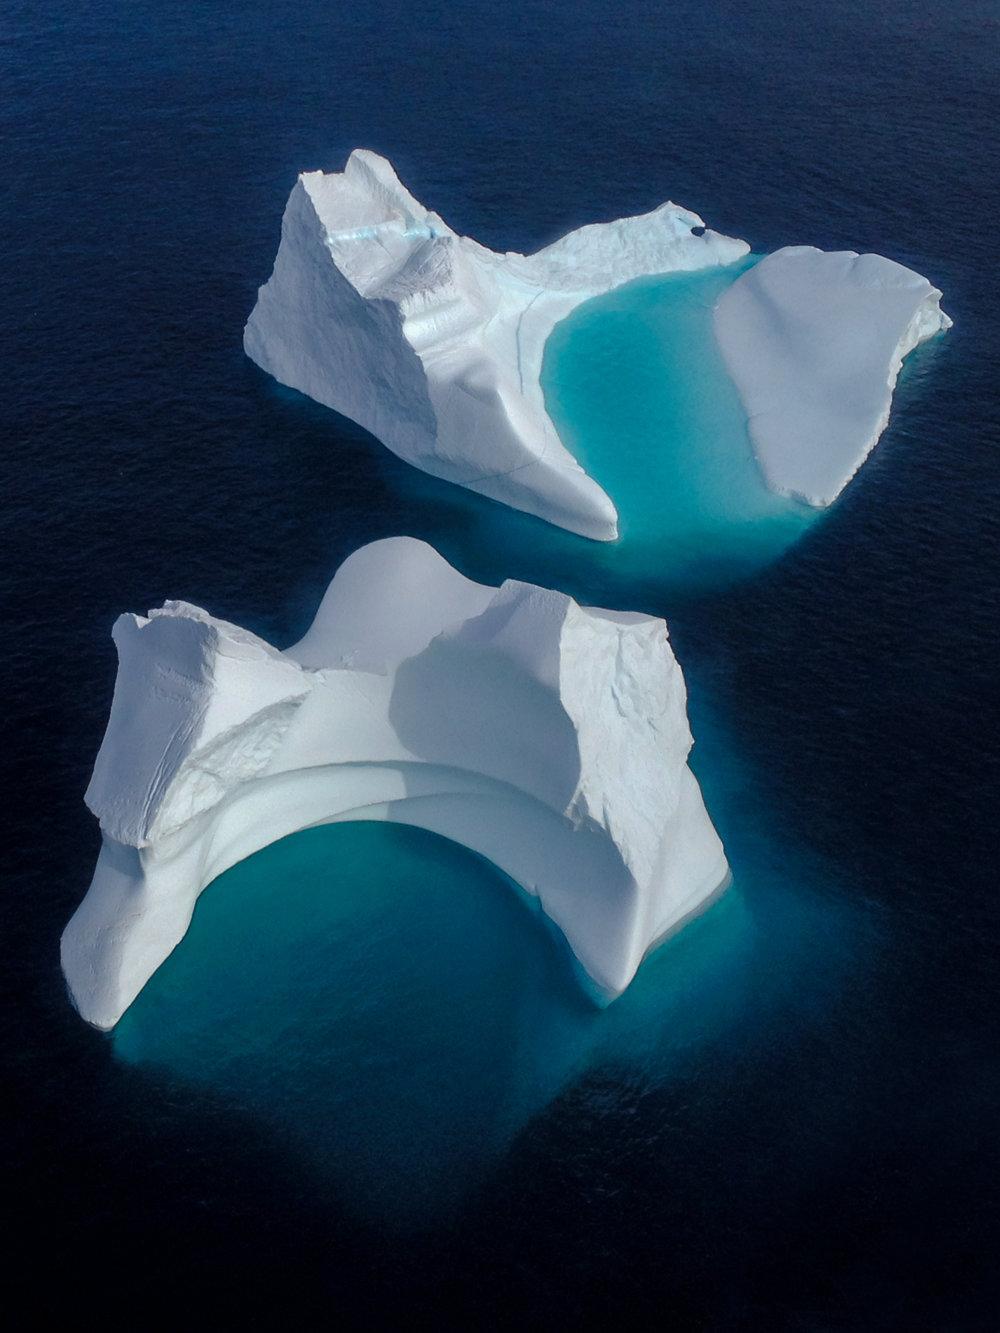 120825_Greenland-15-Edit.jpg